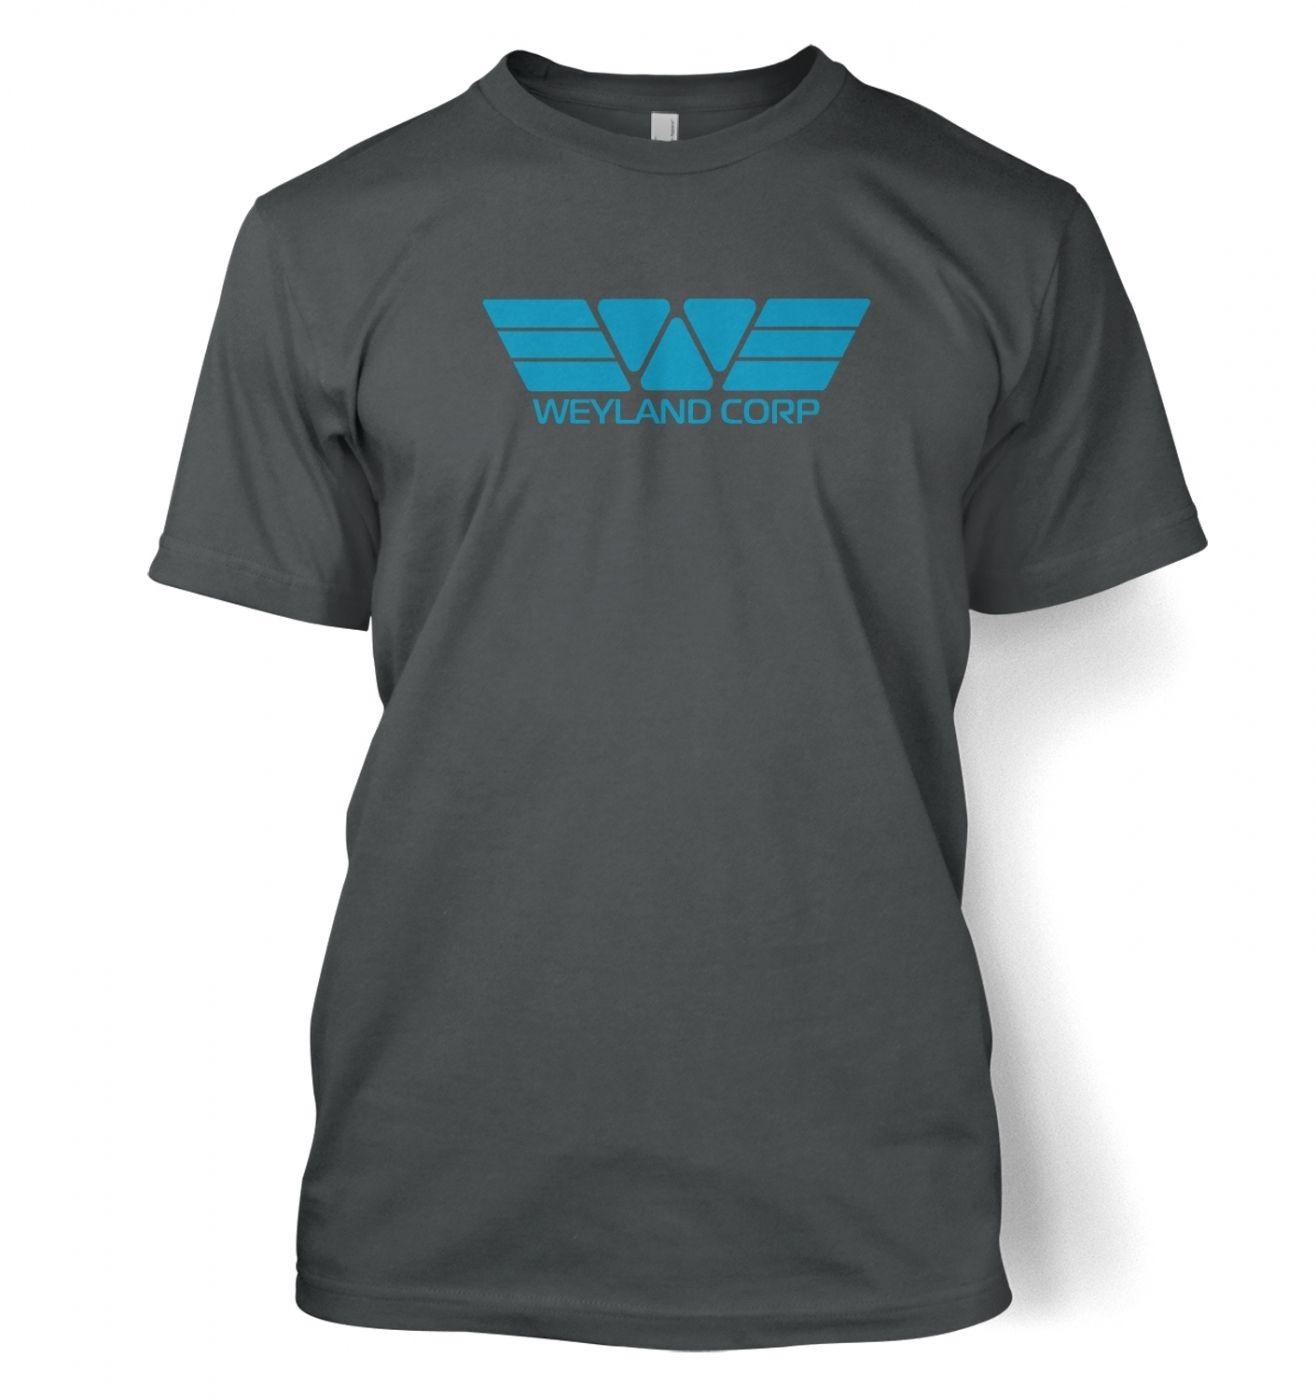 Weyland Corp (blue) men's t-shirt